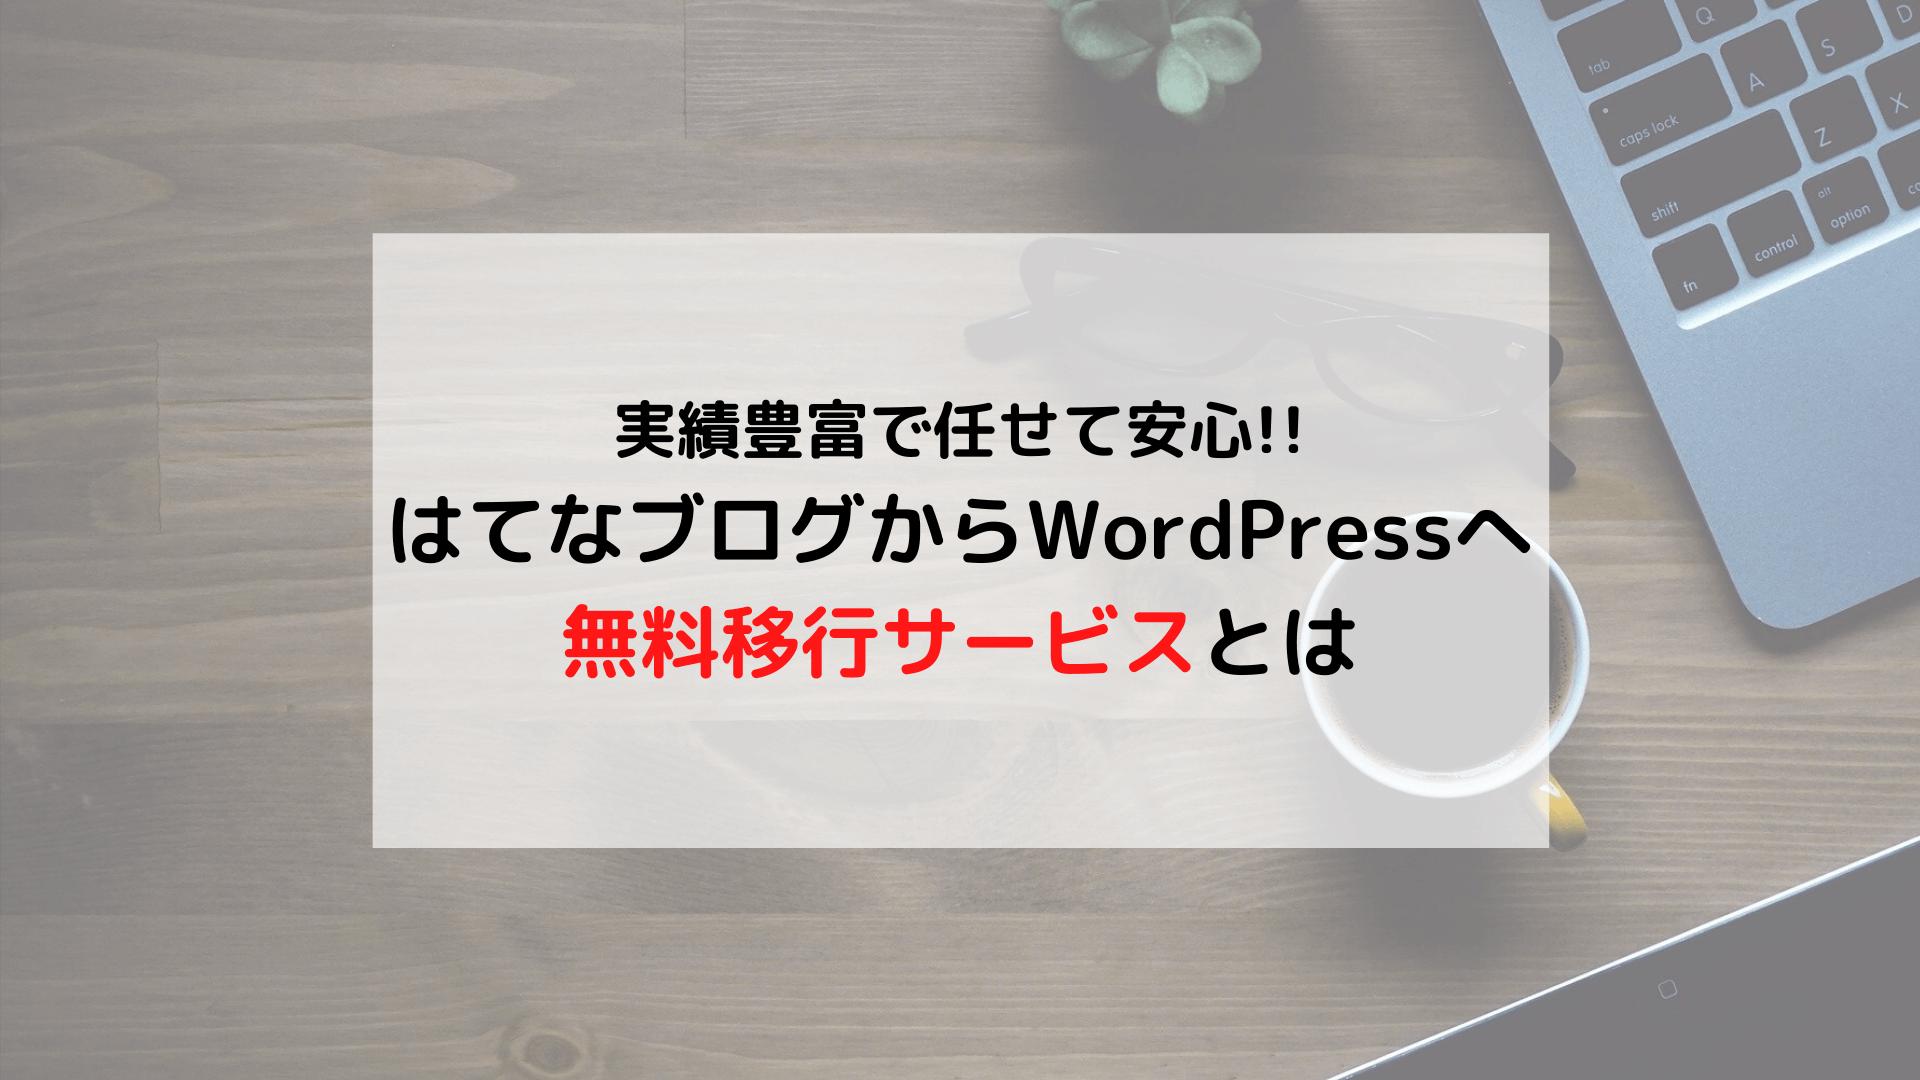 WordPressへの無料移行サービス